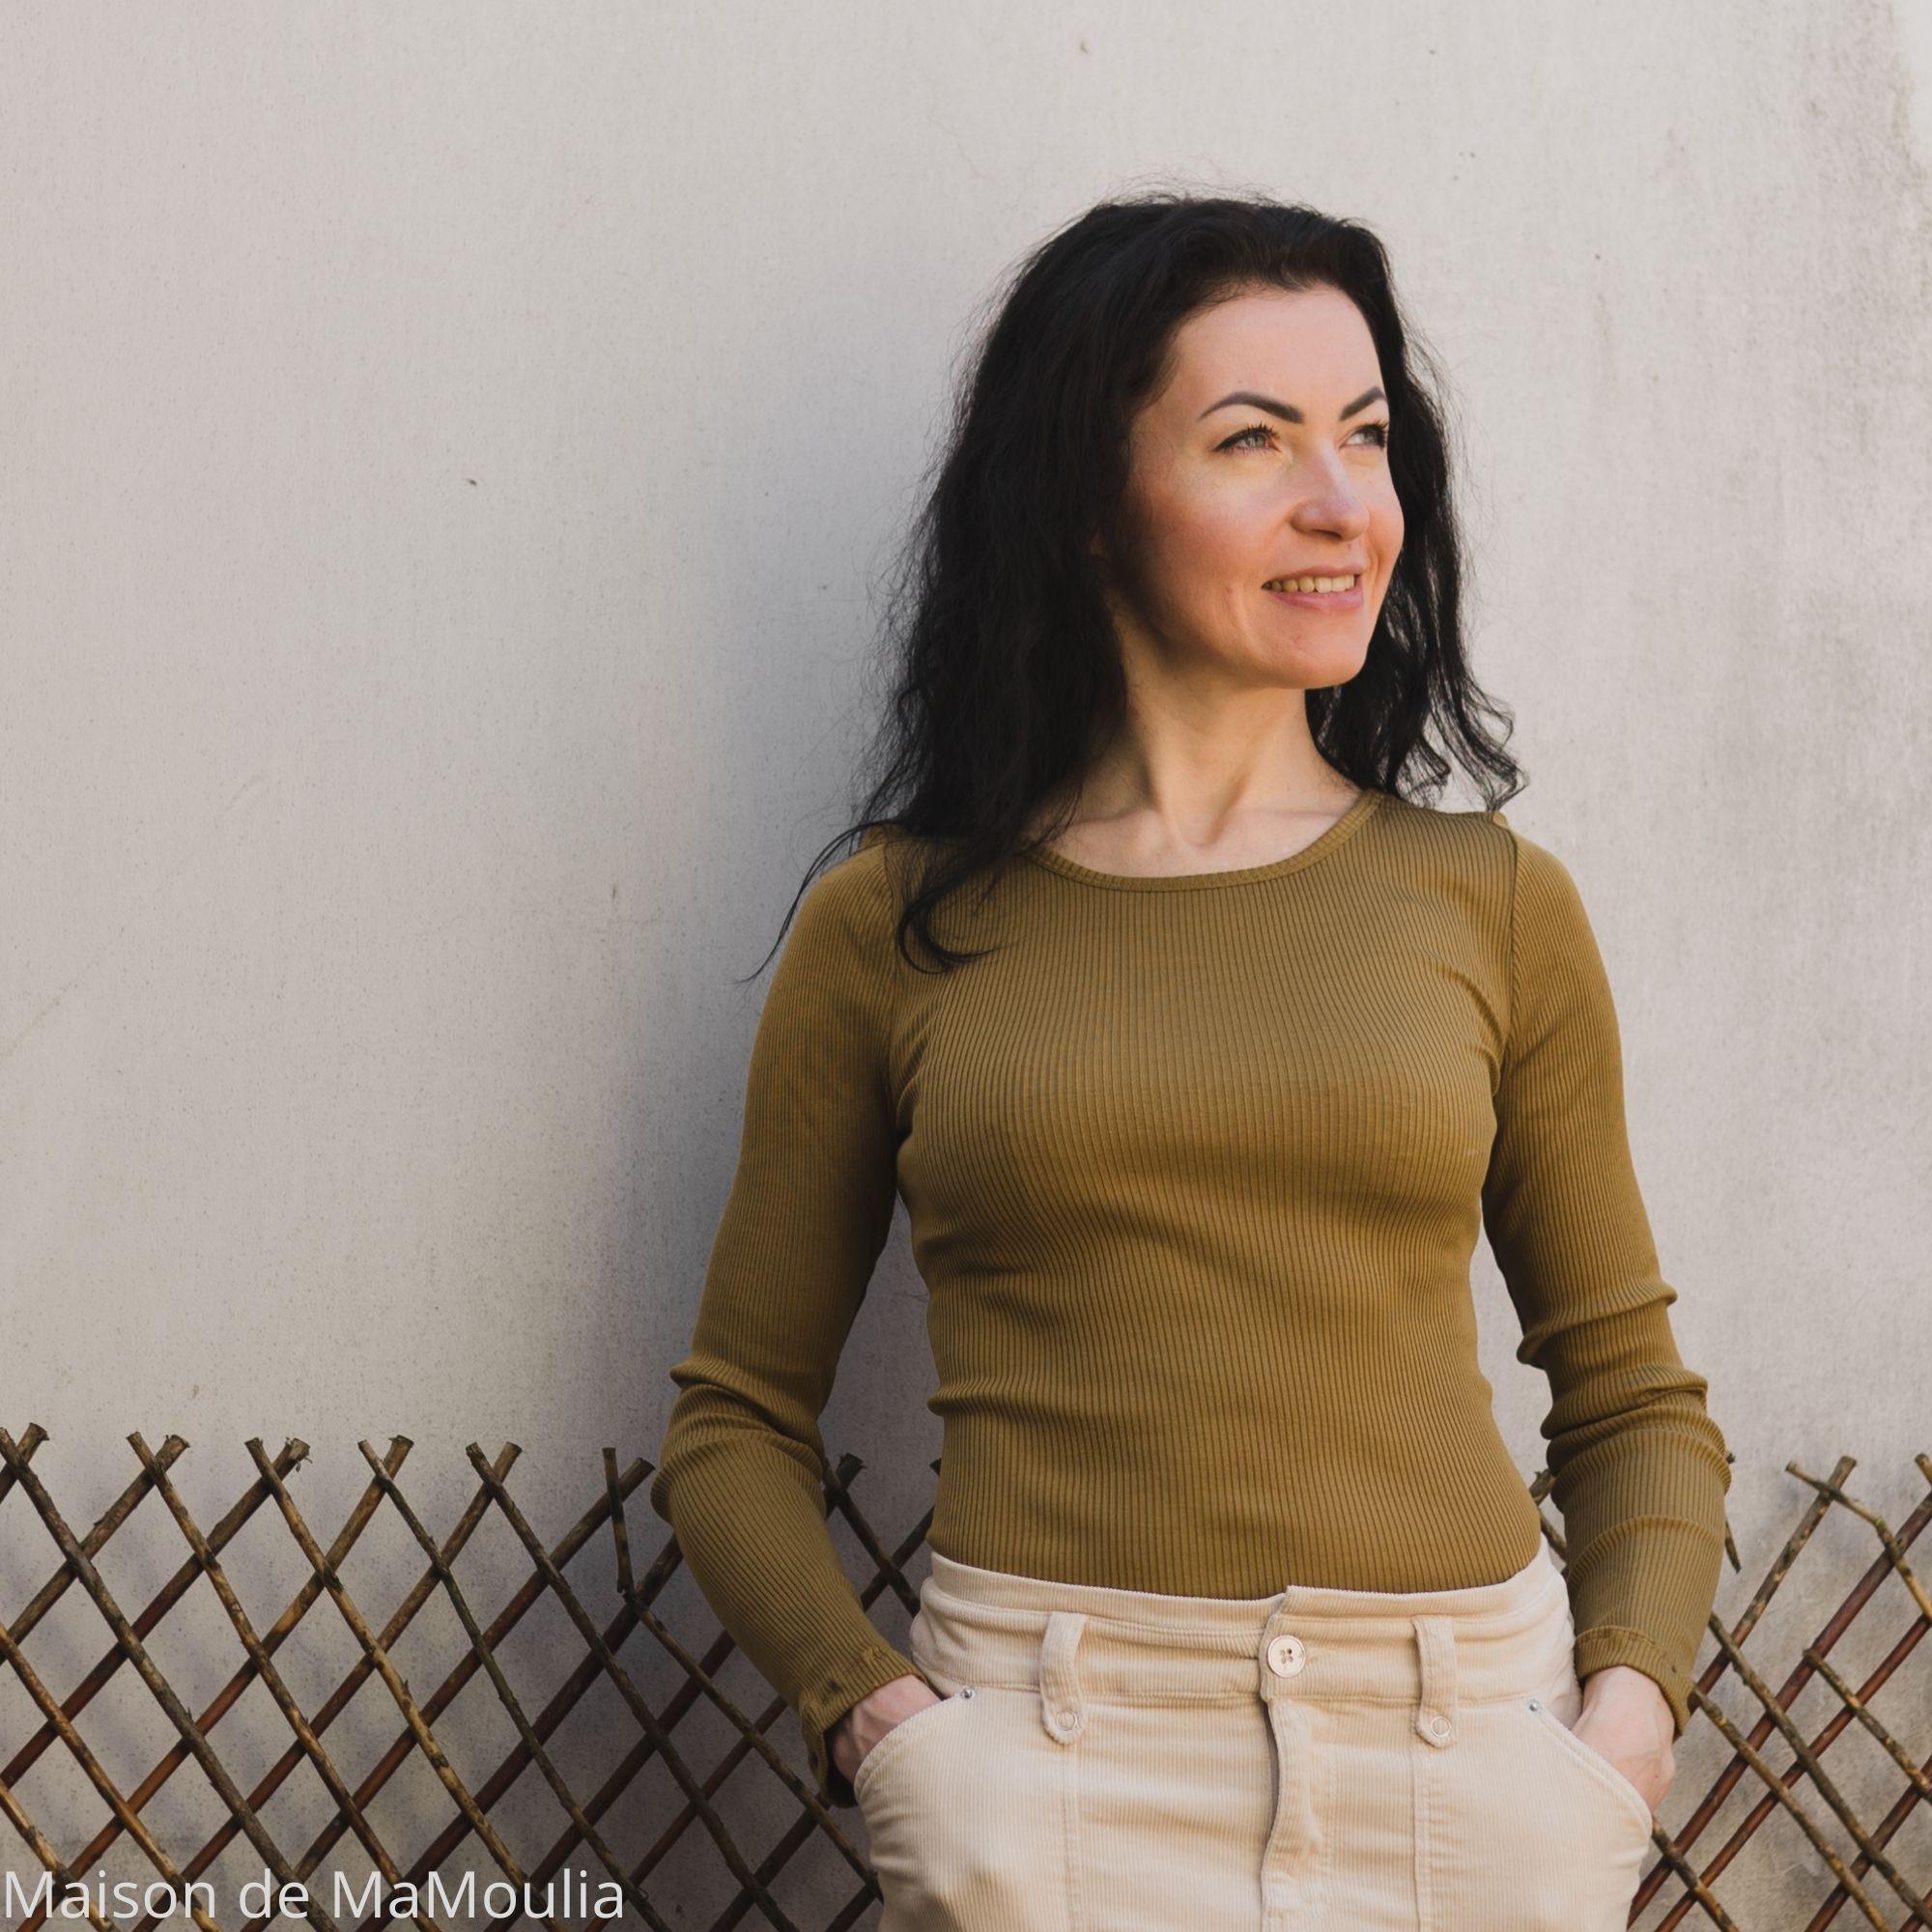 minimalisma-Gerda-Seaweed-tshirt-femme-soie-coton-maison-de-mamoulia-vert-manches-longues